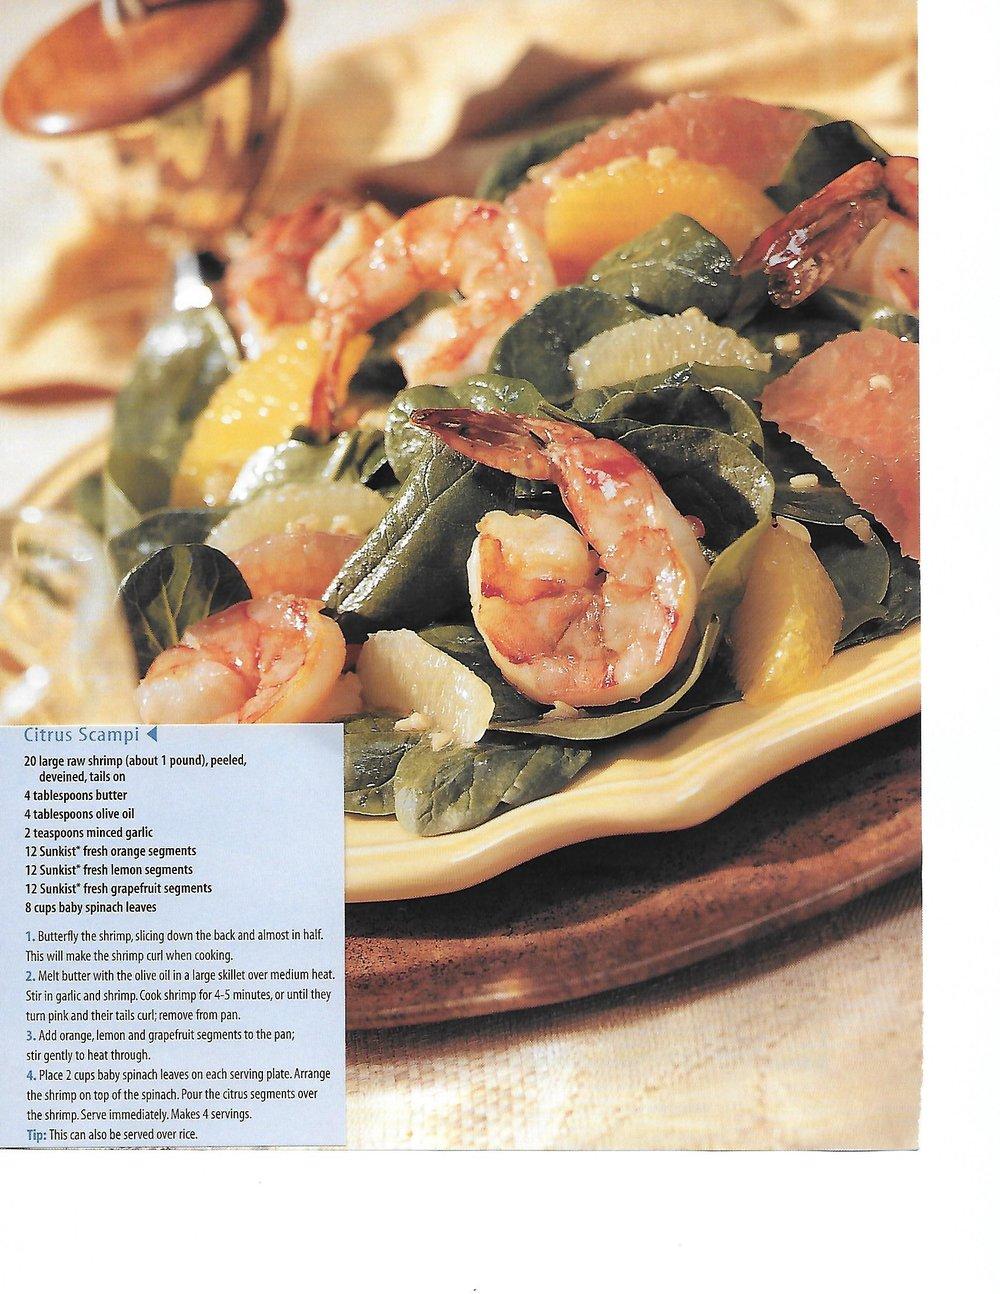 Costco Shrimp 8.jpg